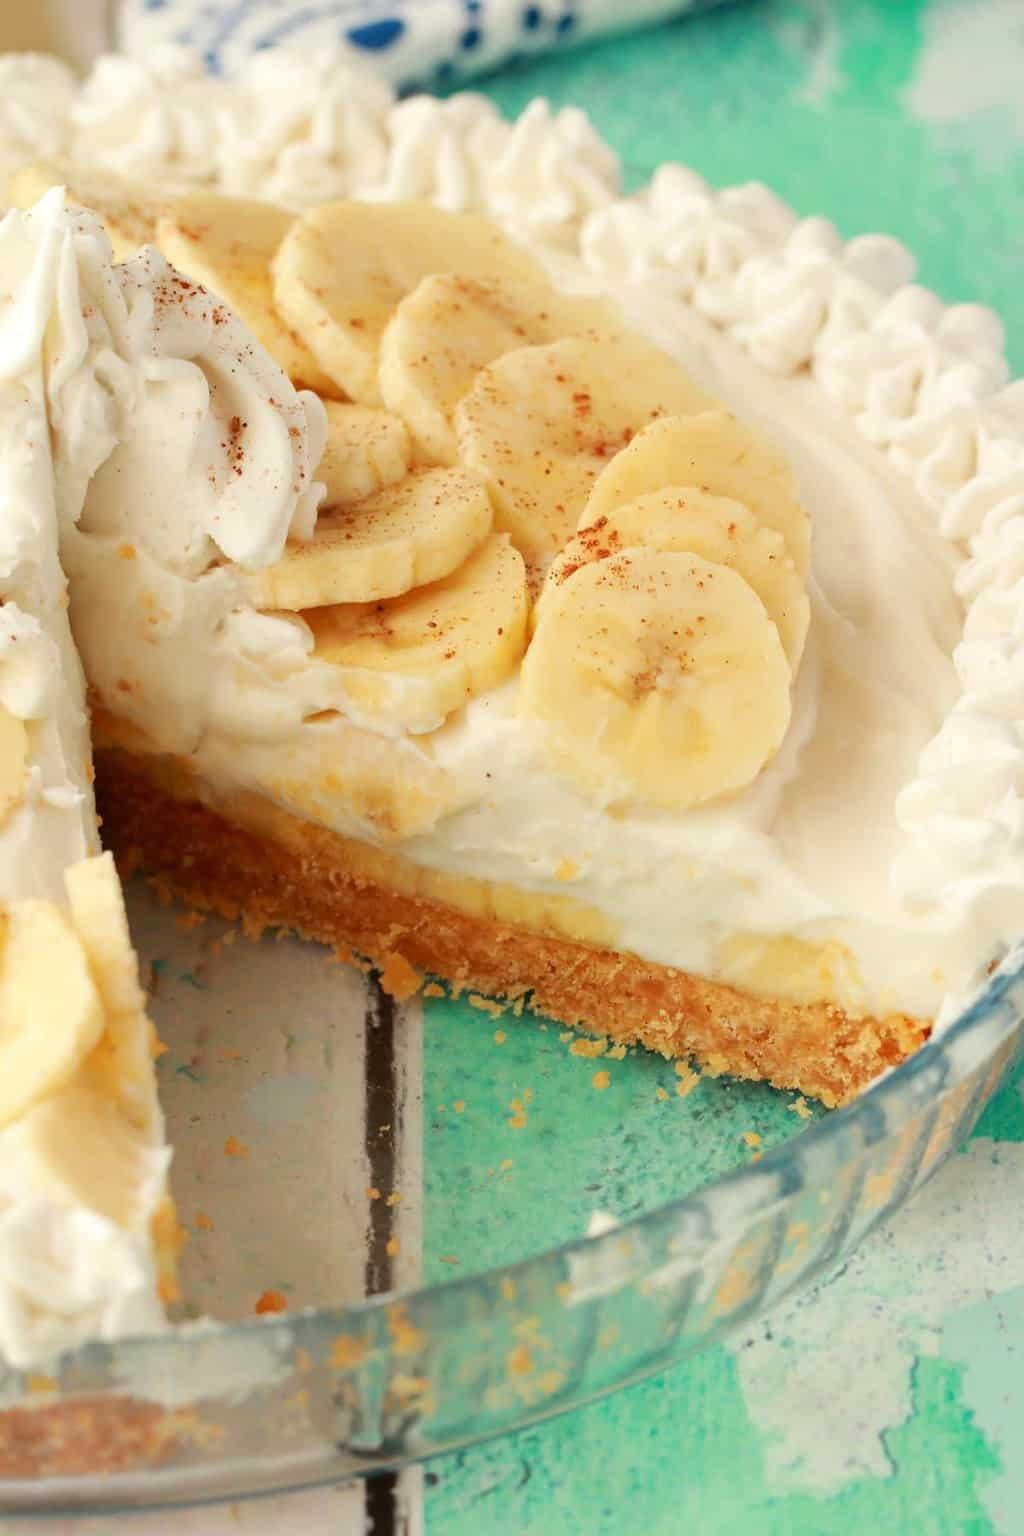 Vegan banana cream pie in a glass pie dish.